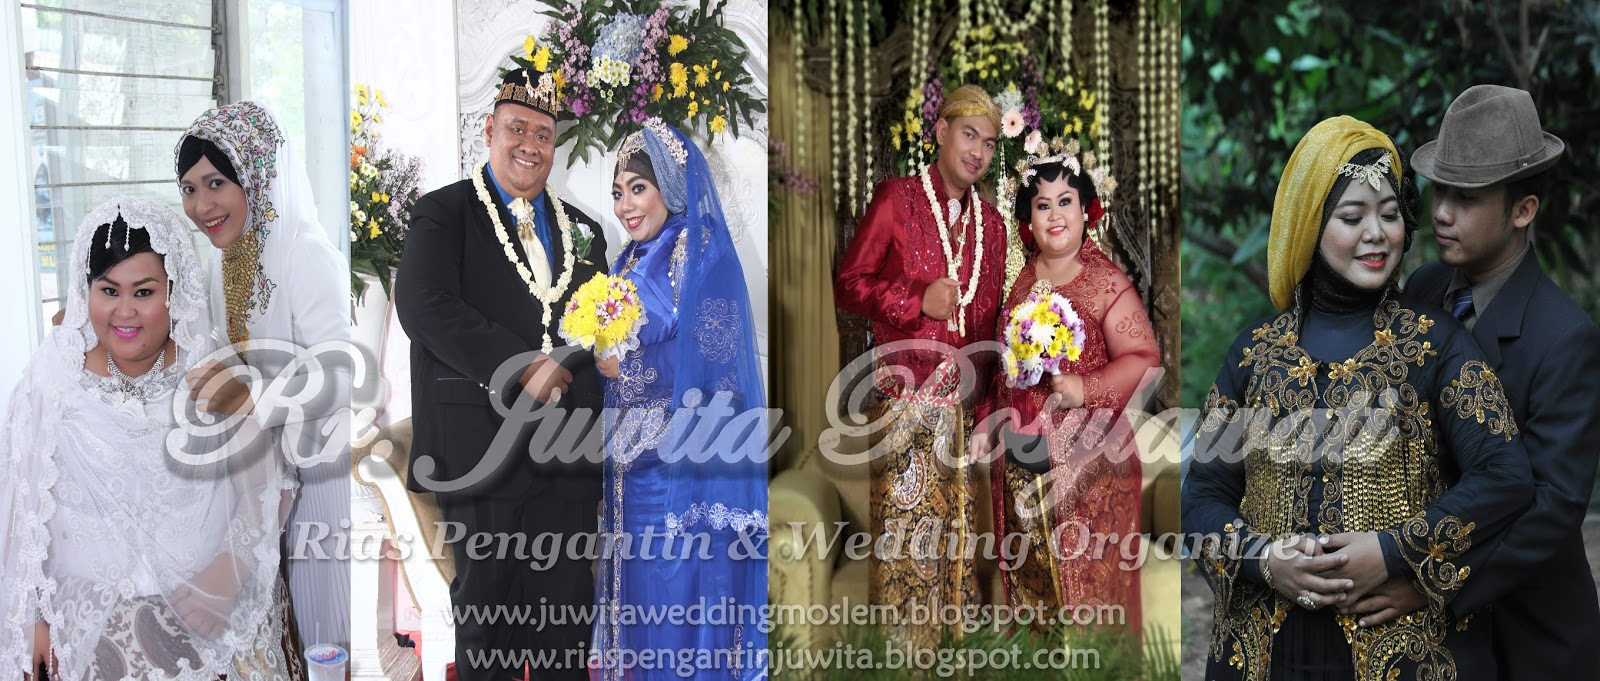 Paket Pernikahan Dan Pusat Sewa Busana Jumbo Big Size Koleksi